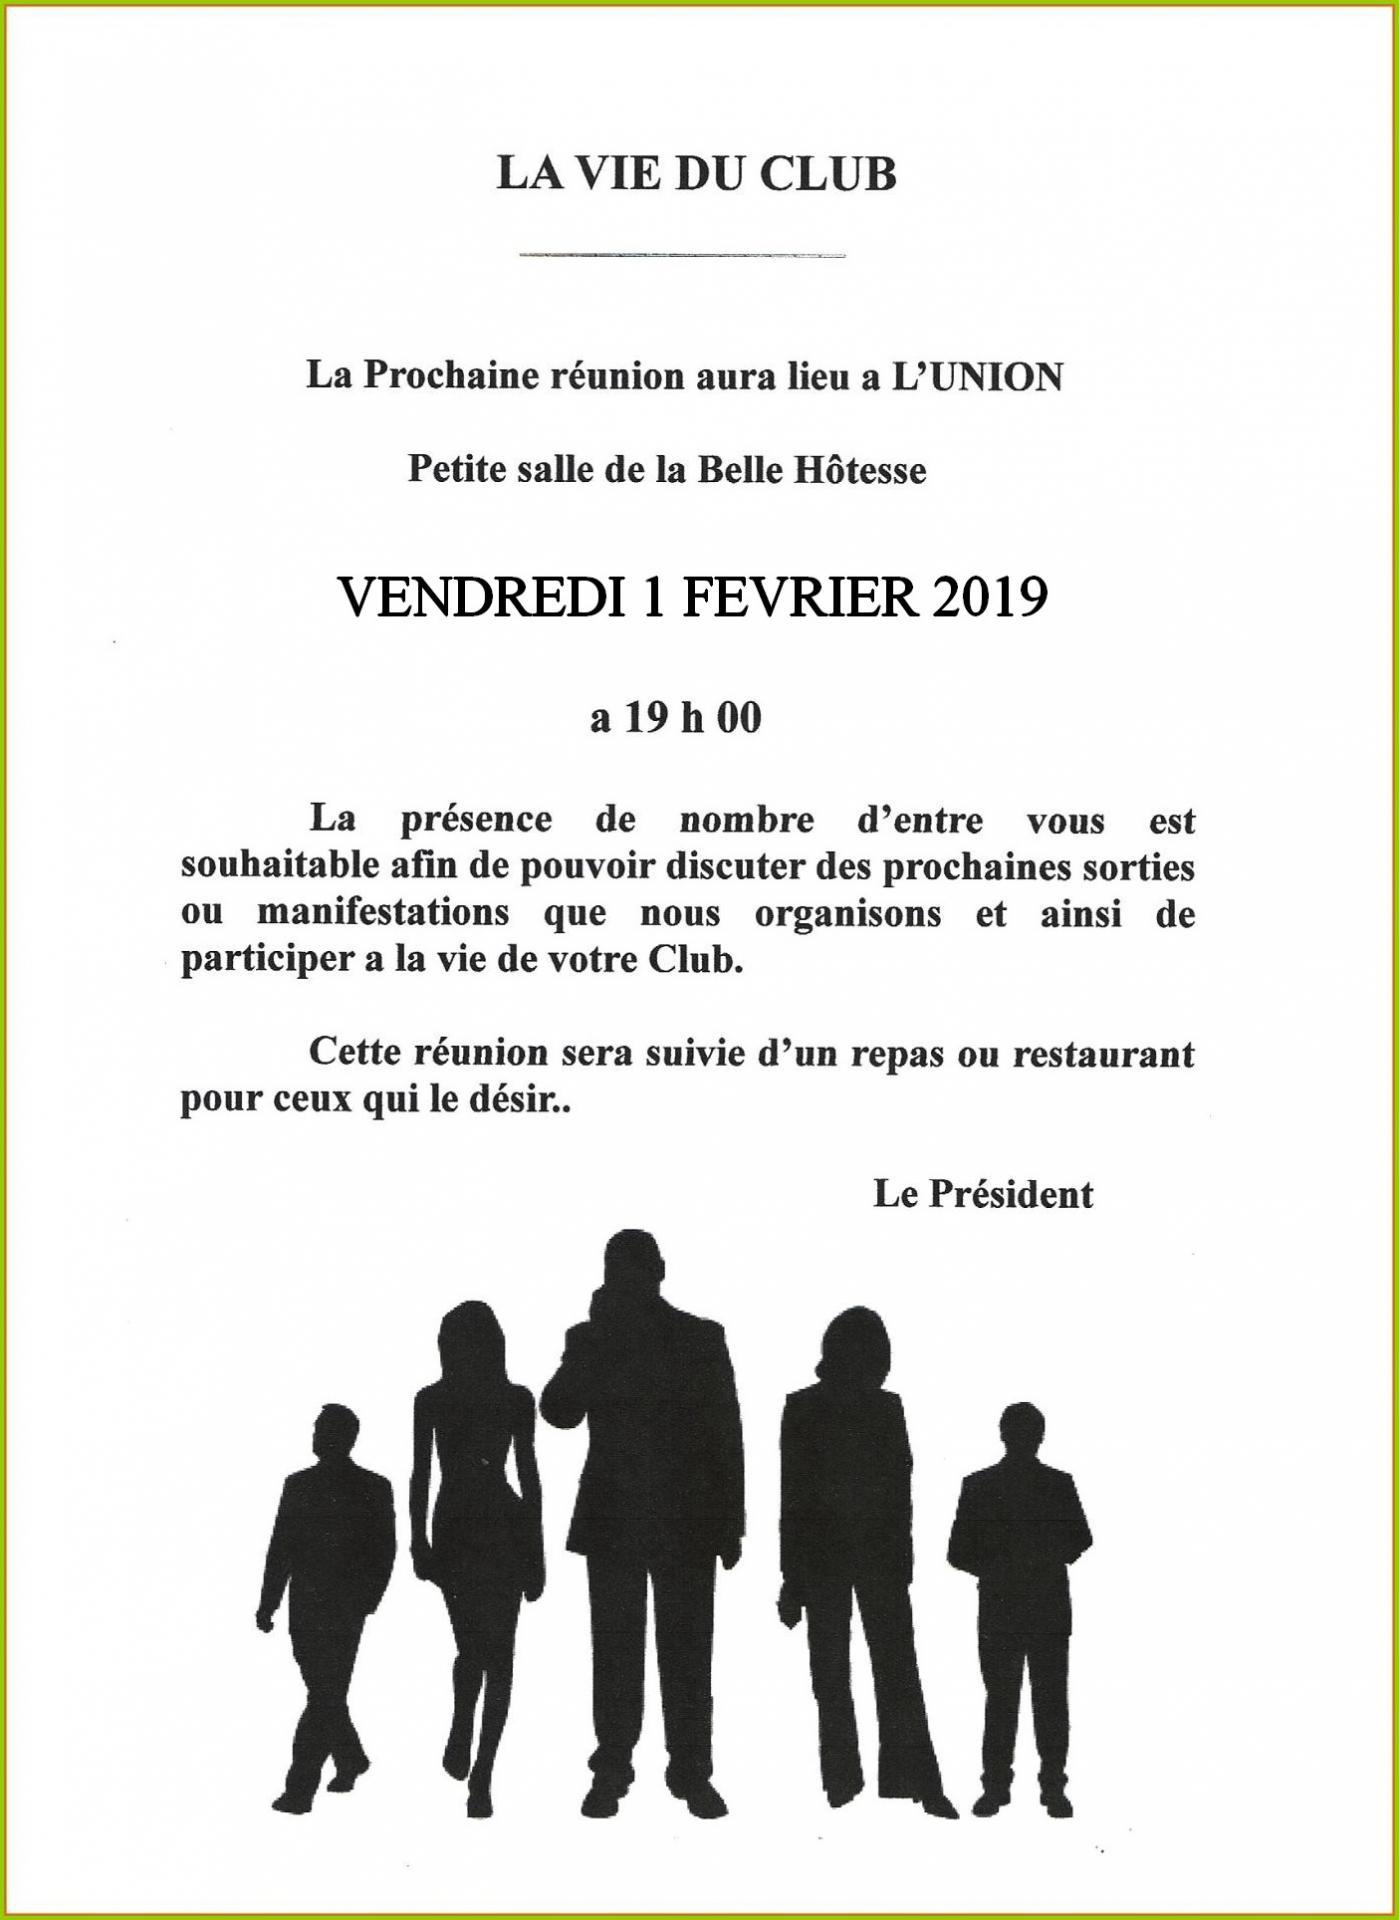 Reunion belle hotesse 02 2019